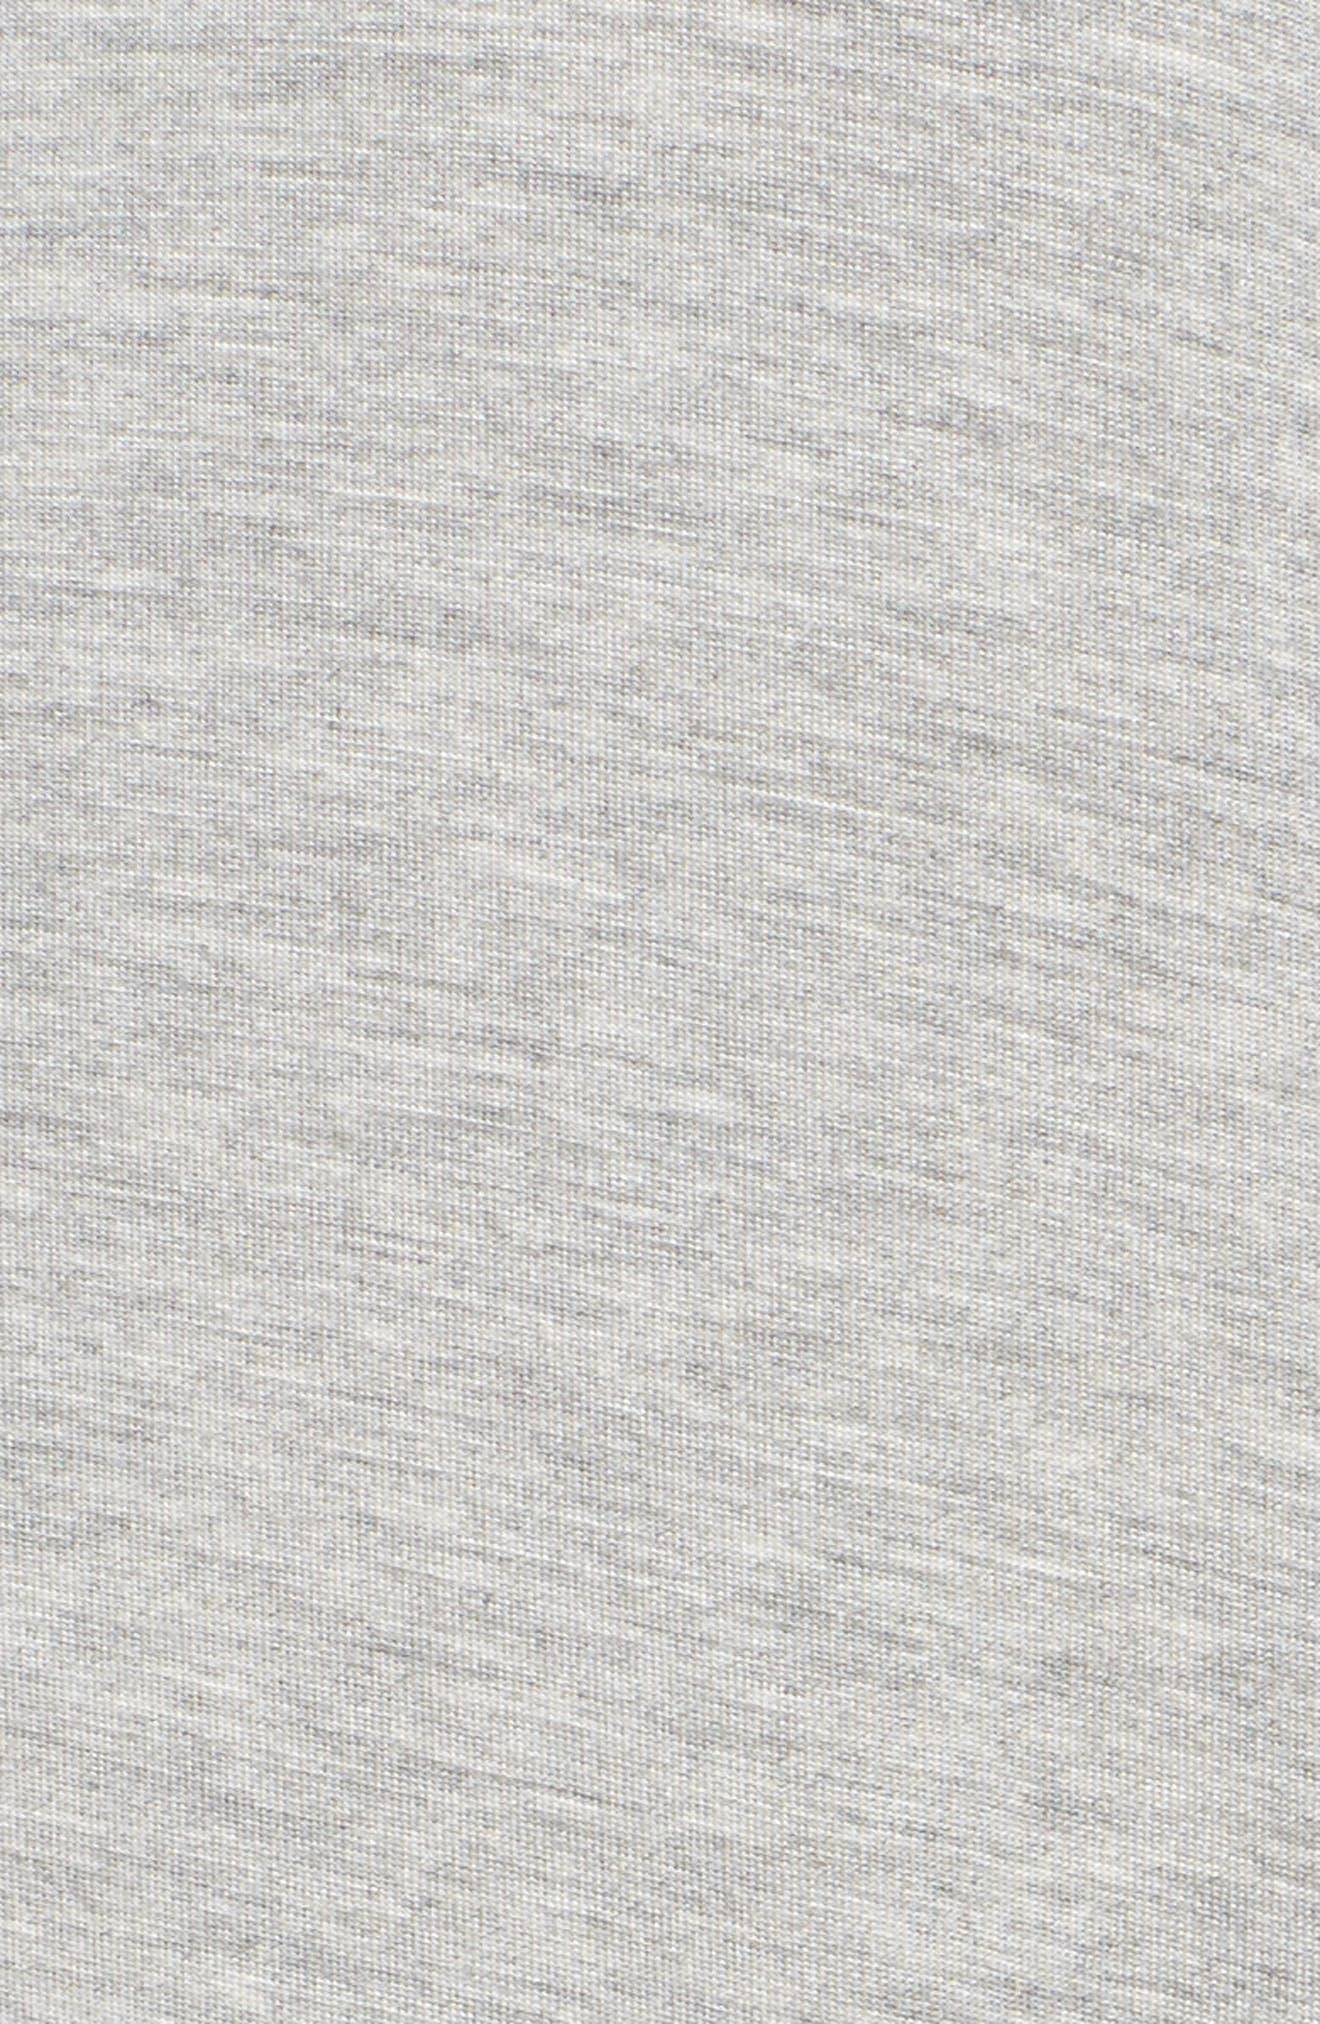 LAUREN RALPH LAUREN, Ballet Jersey Sleep Shirt, Alternate thumbnail 5, color, HEATHER GREY FEEDER STRIPE